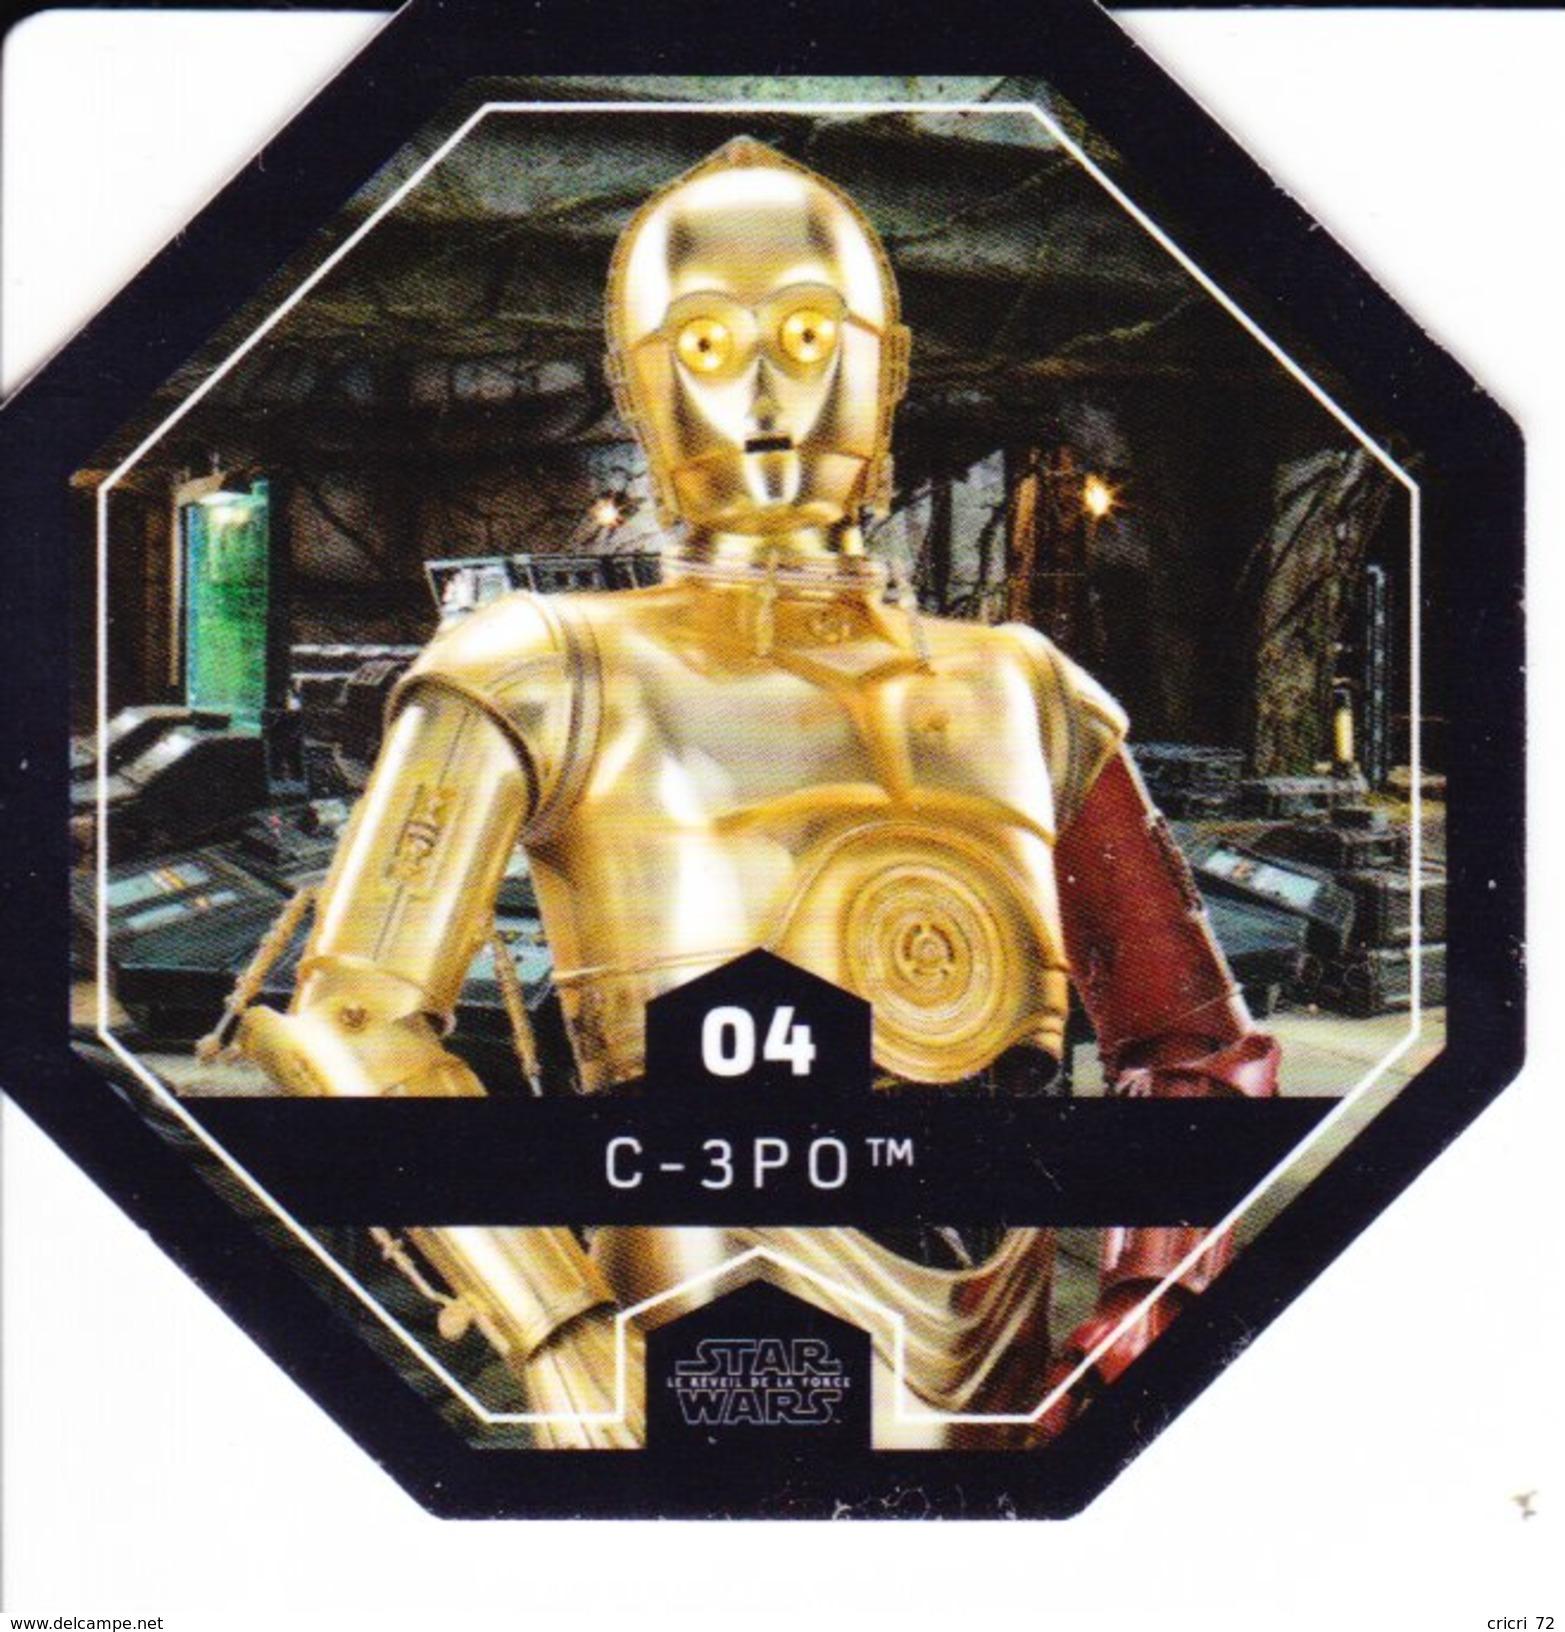 04 C-3 P O 2016 STAR WARS LECLERC COSMIC SHELLS - Episodio II